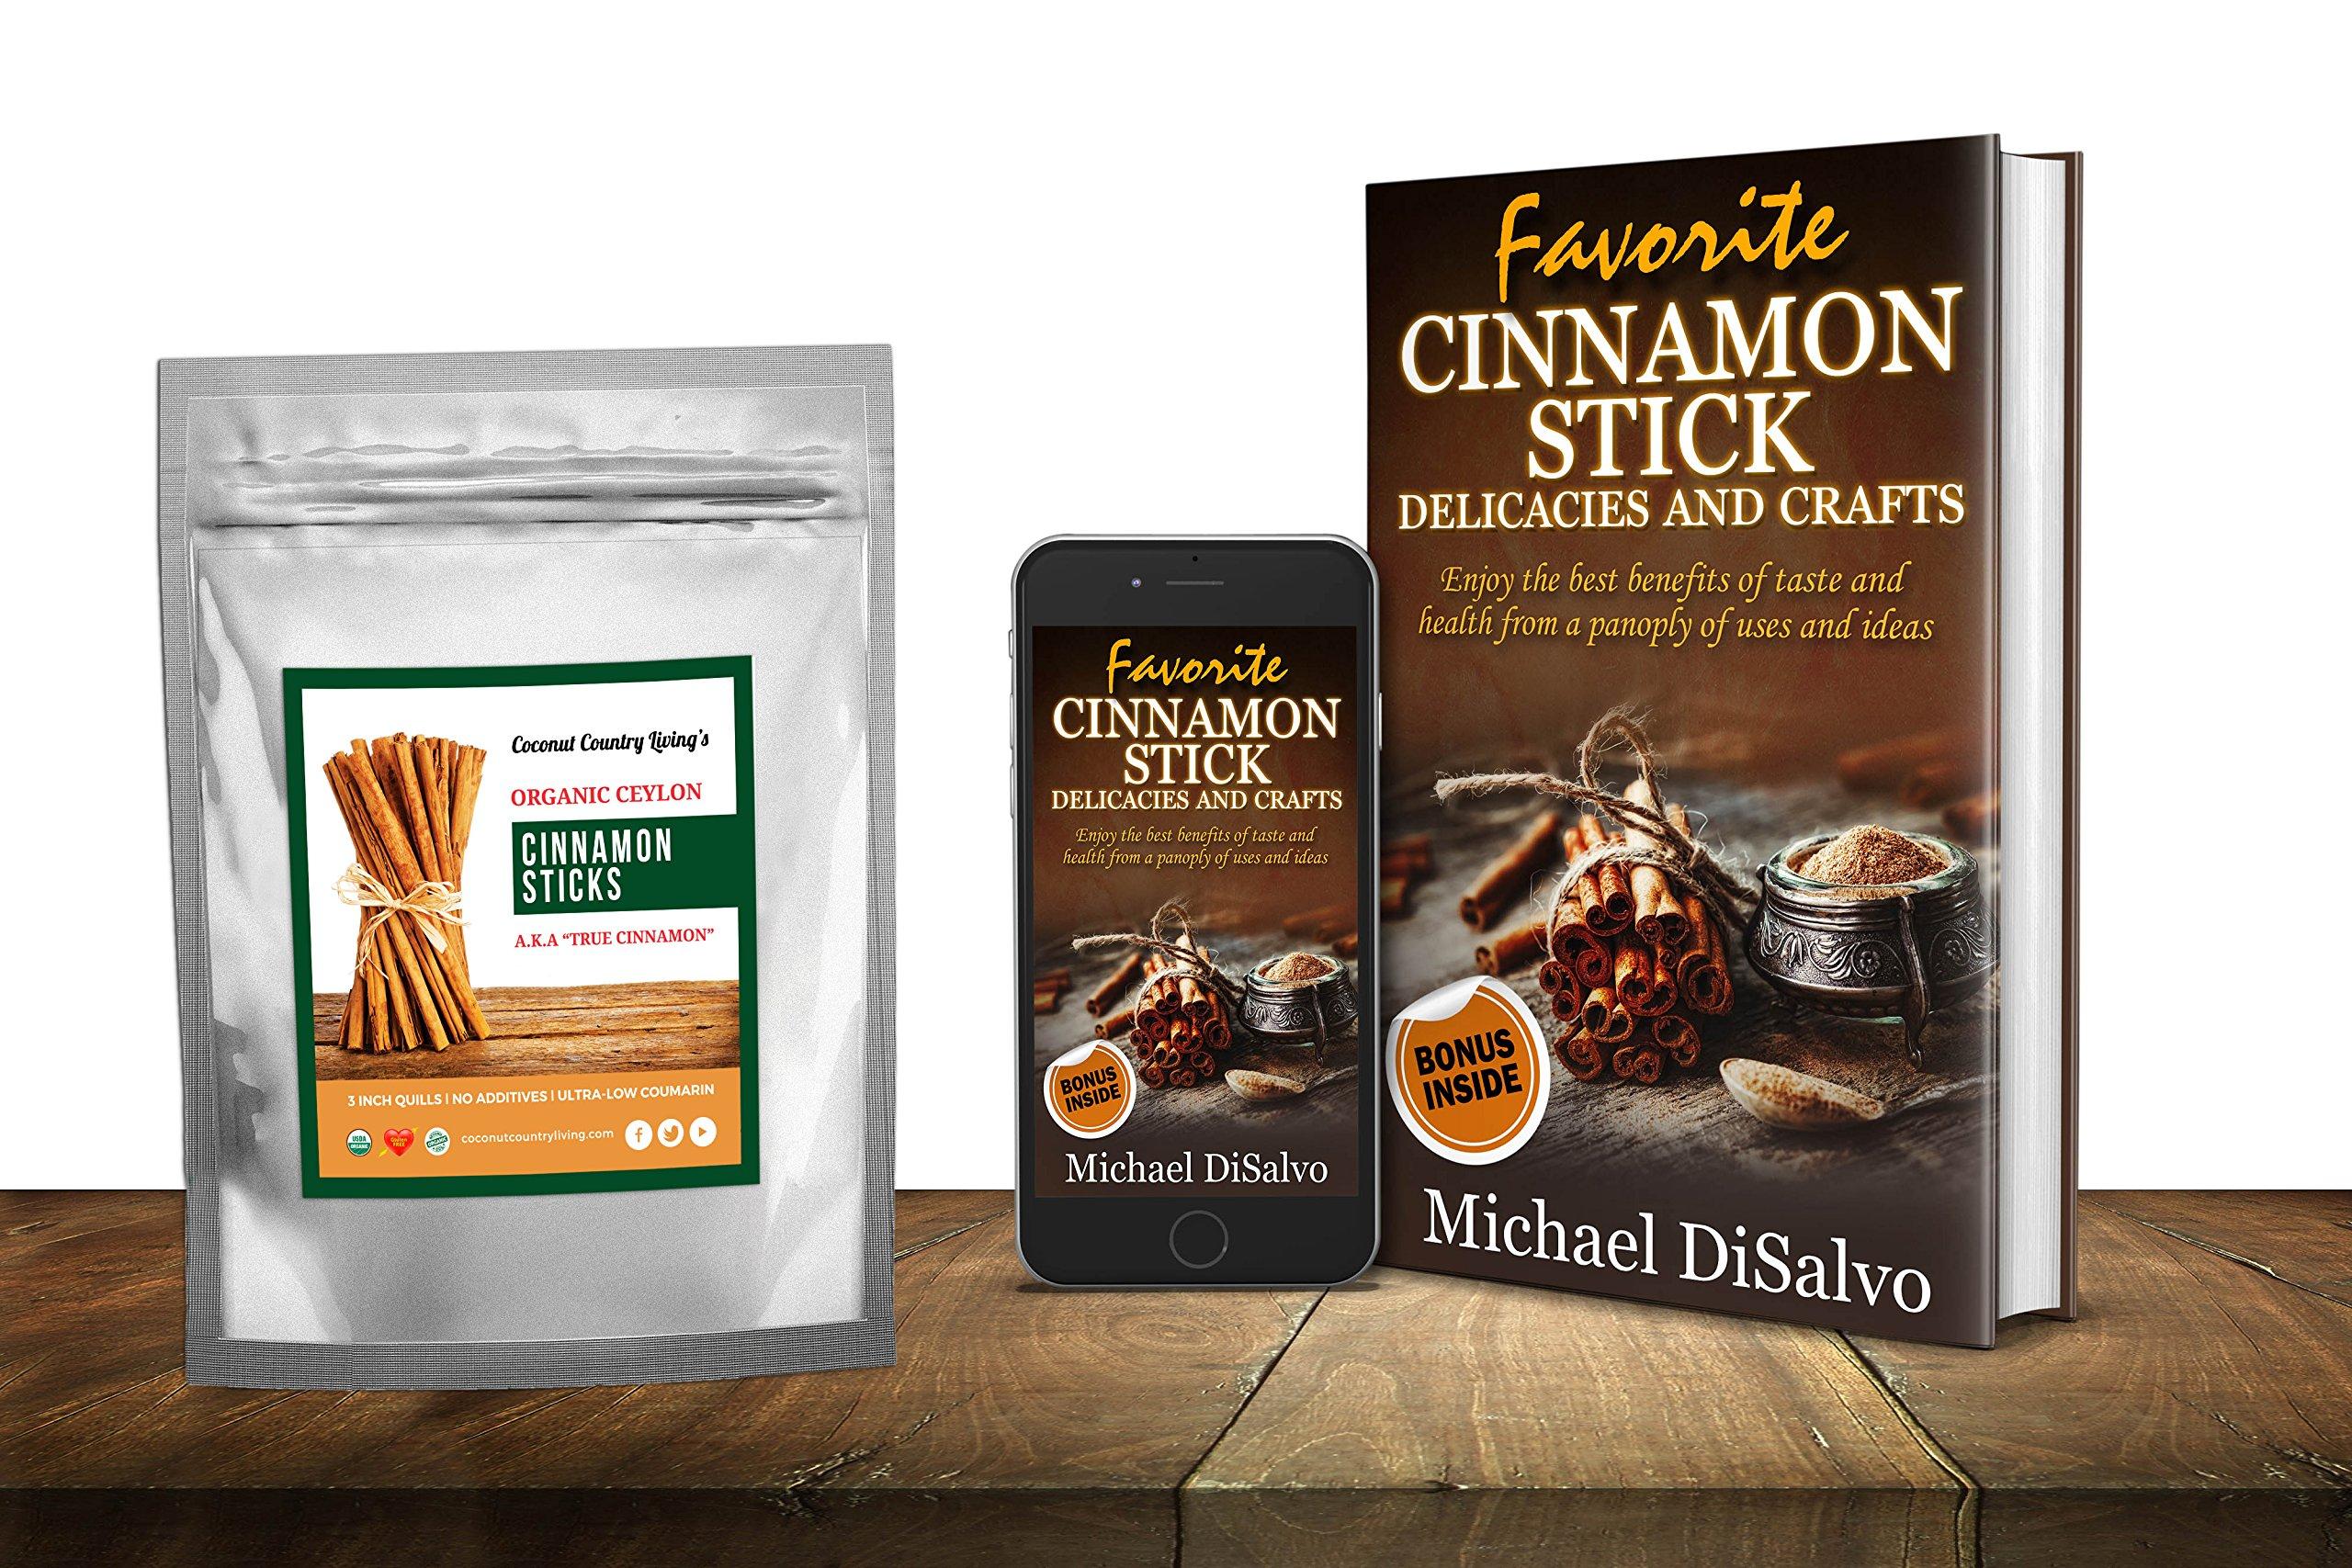 Organic Cinnamon Sticks Ceylon 3.5 oz Fairtrade, Freshly Harvested in Ceylon w/E-BOOK by Coconut Country Living (Image #3)